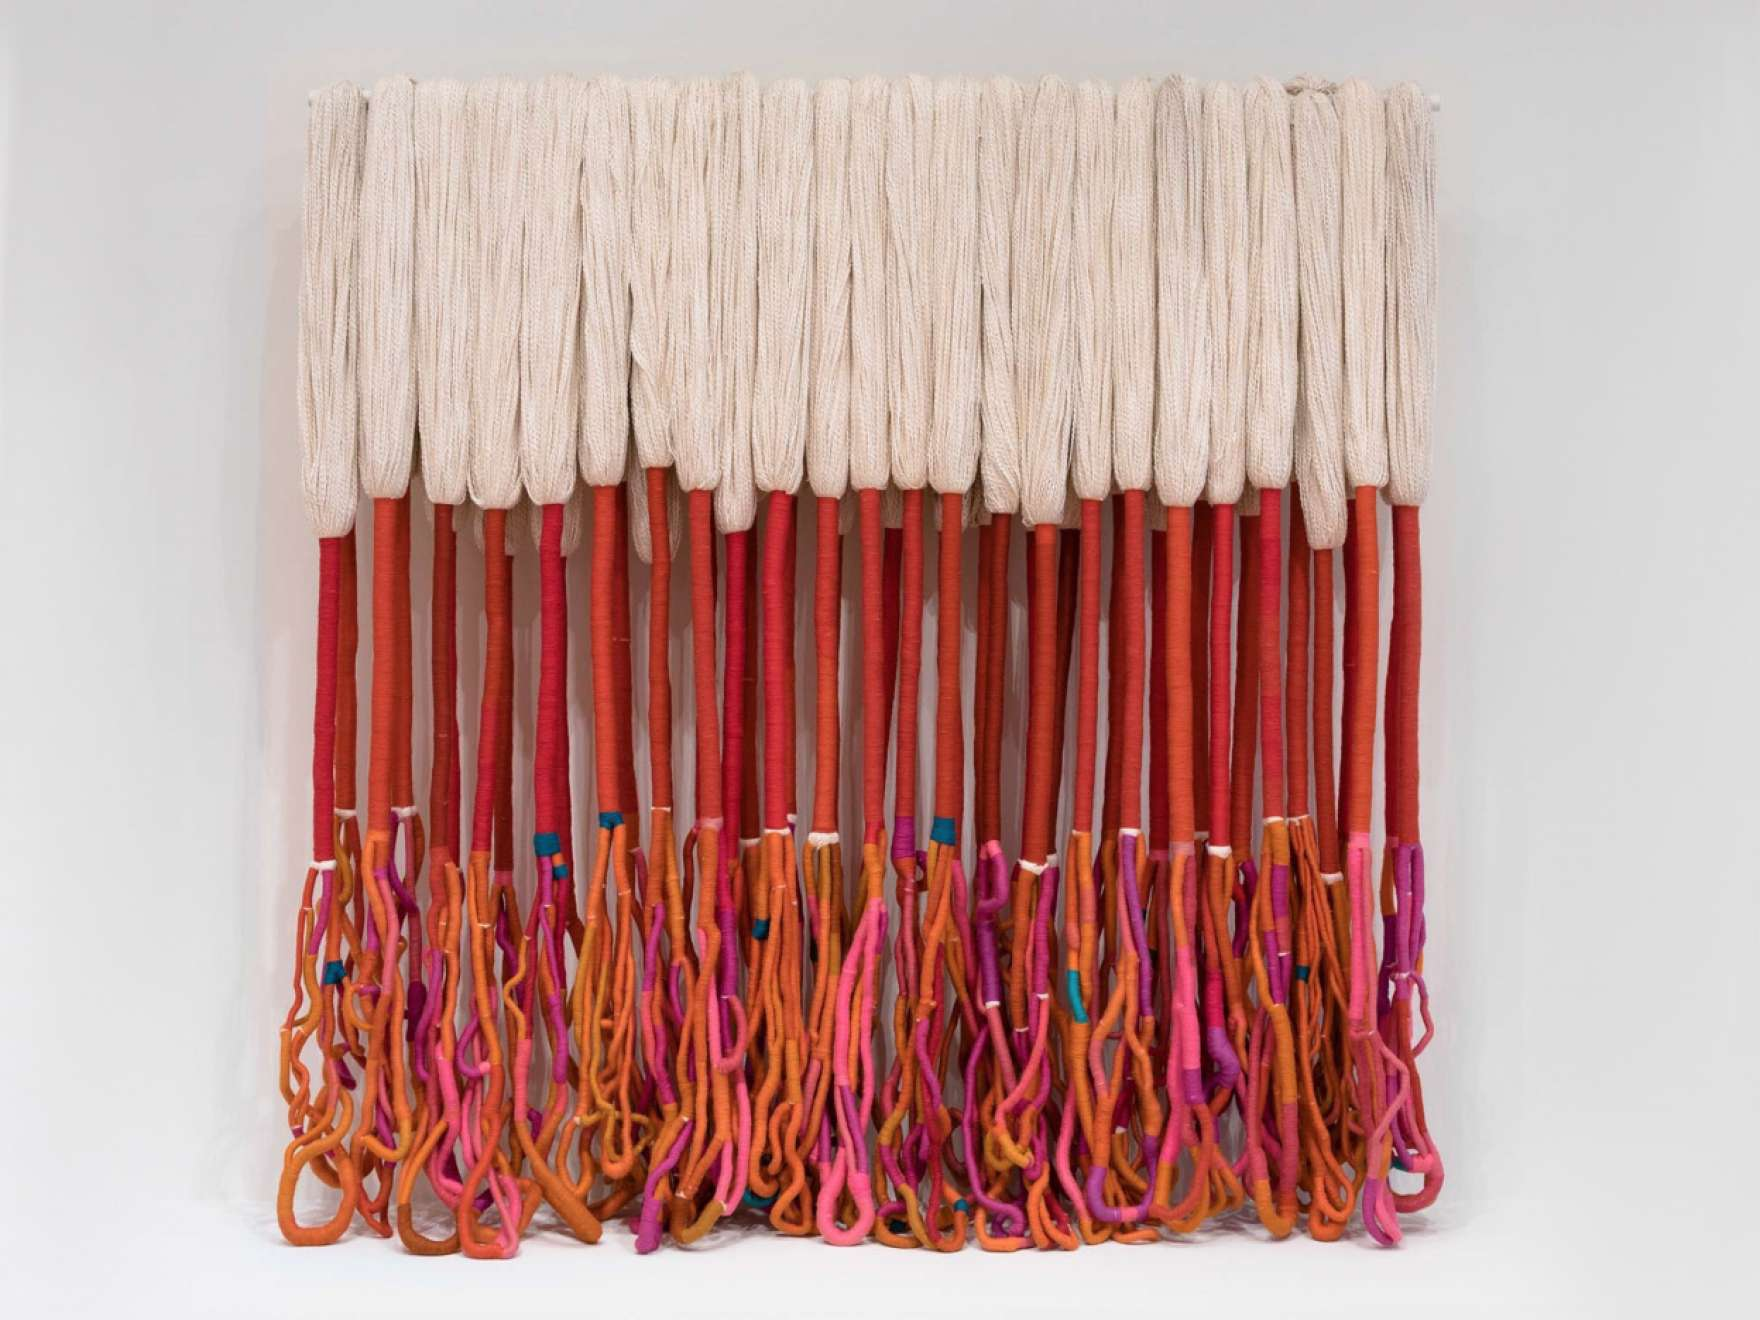 Sheila Hicks' wool and acrylic yarn piece, Bamian